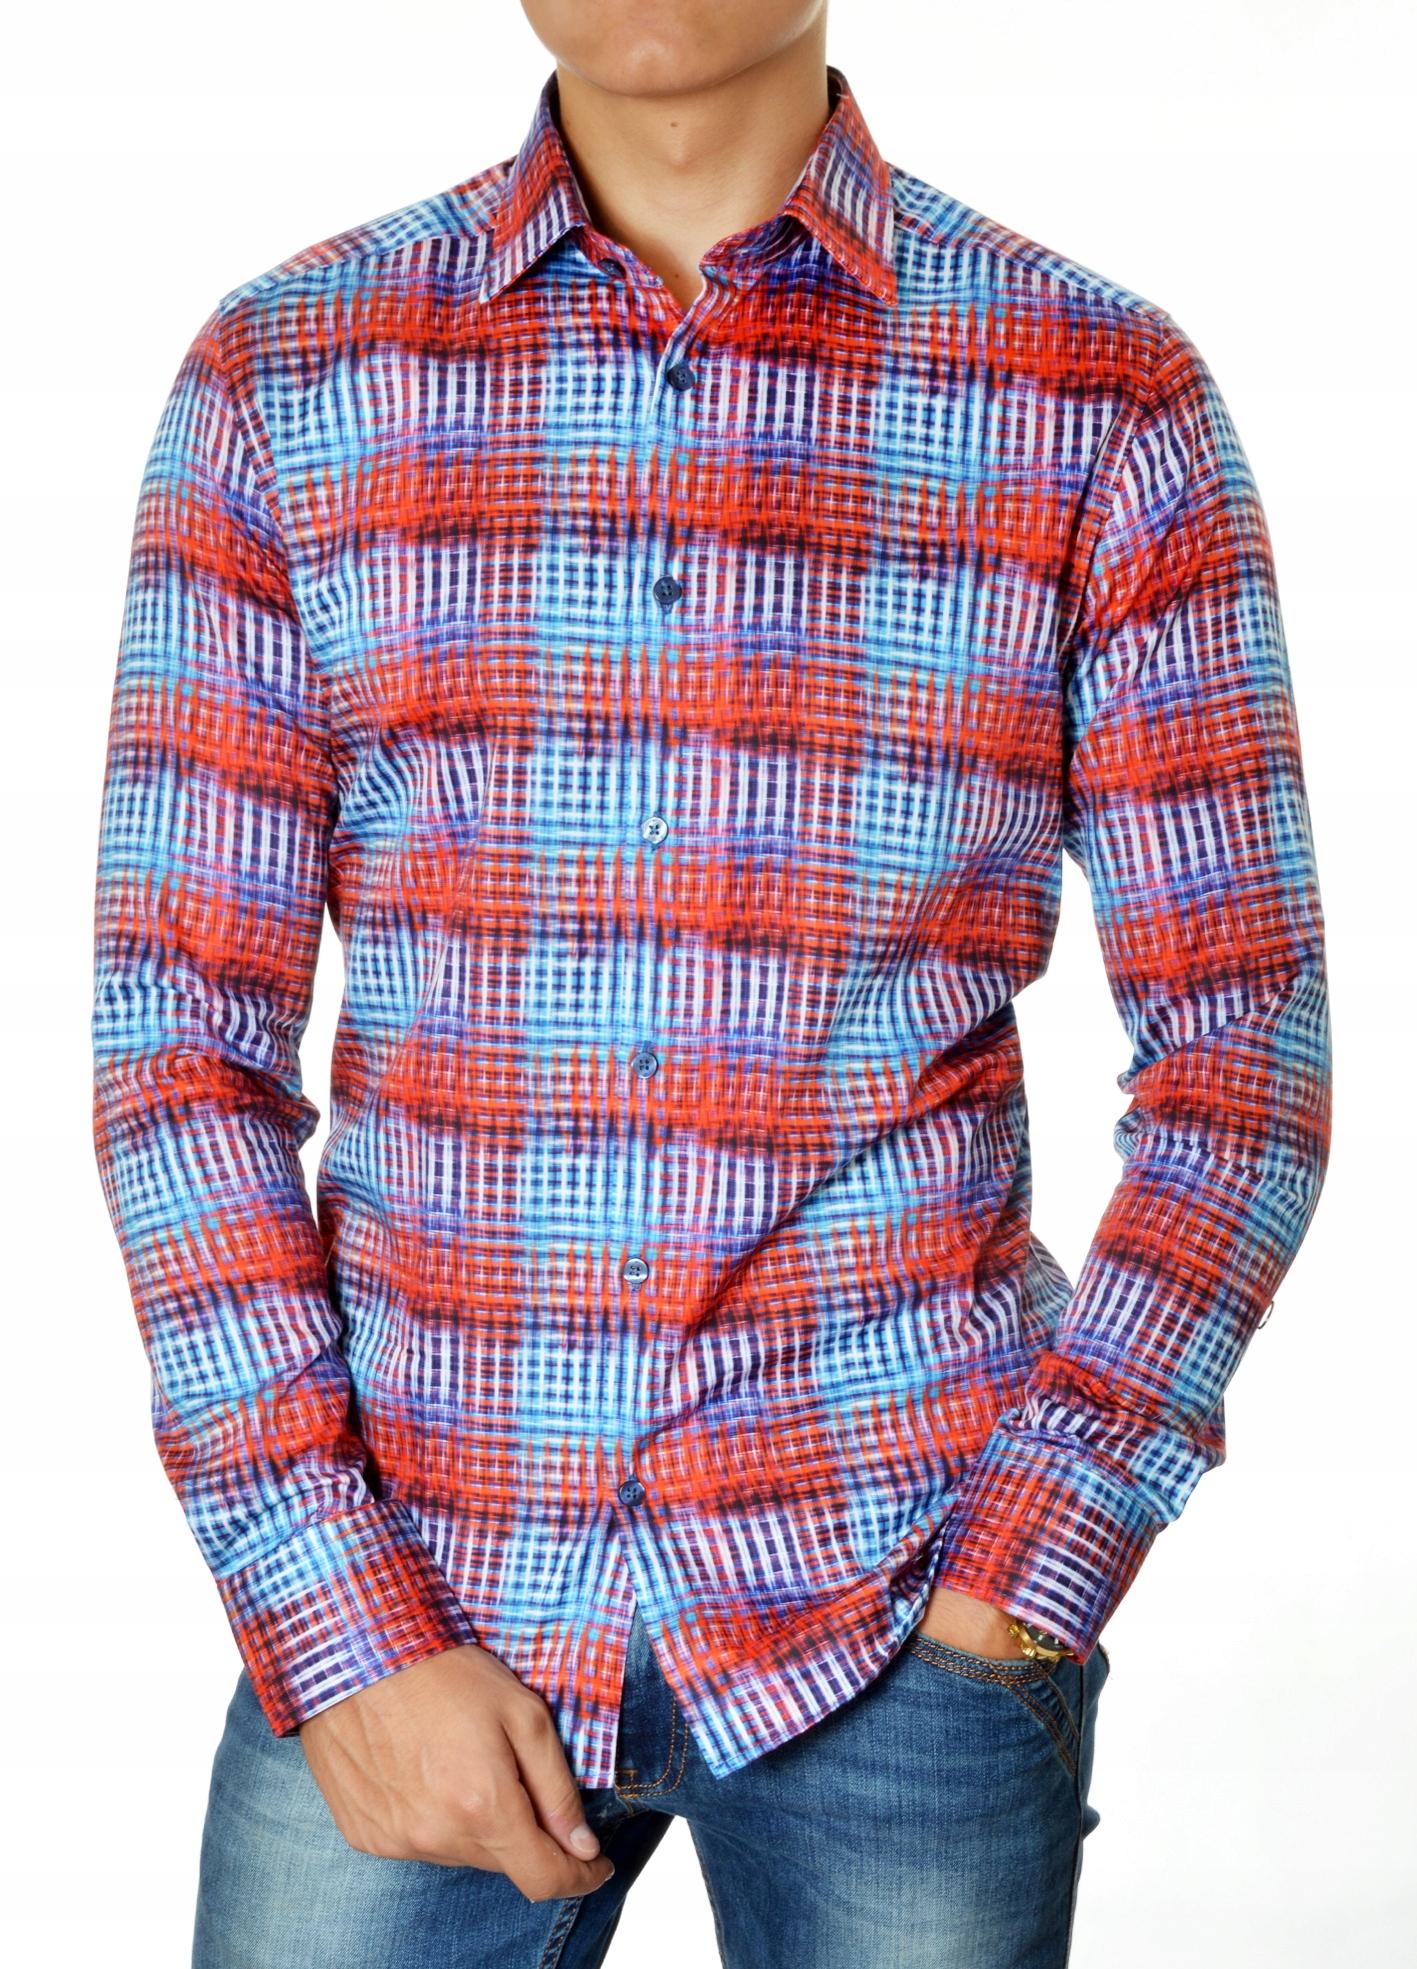 Koszula Męska Modno Casual Comfort Slim Jesień 8472999372  Ocqnd